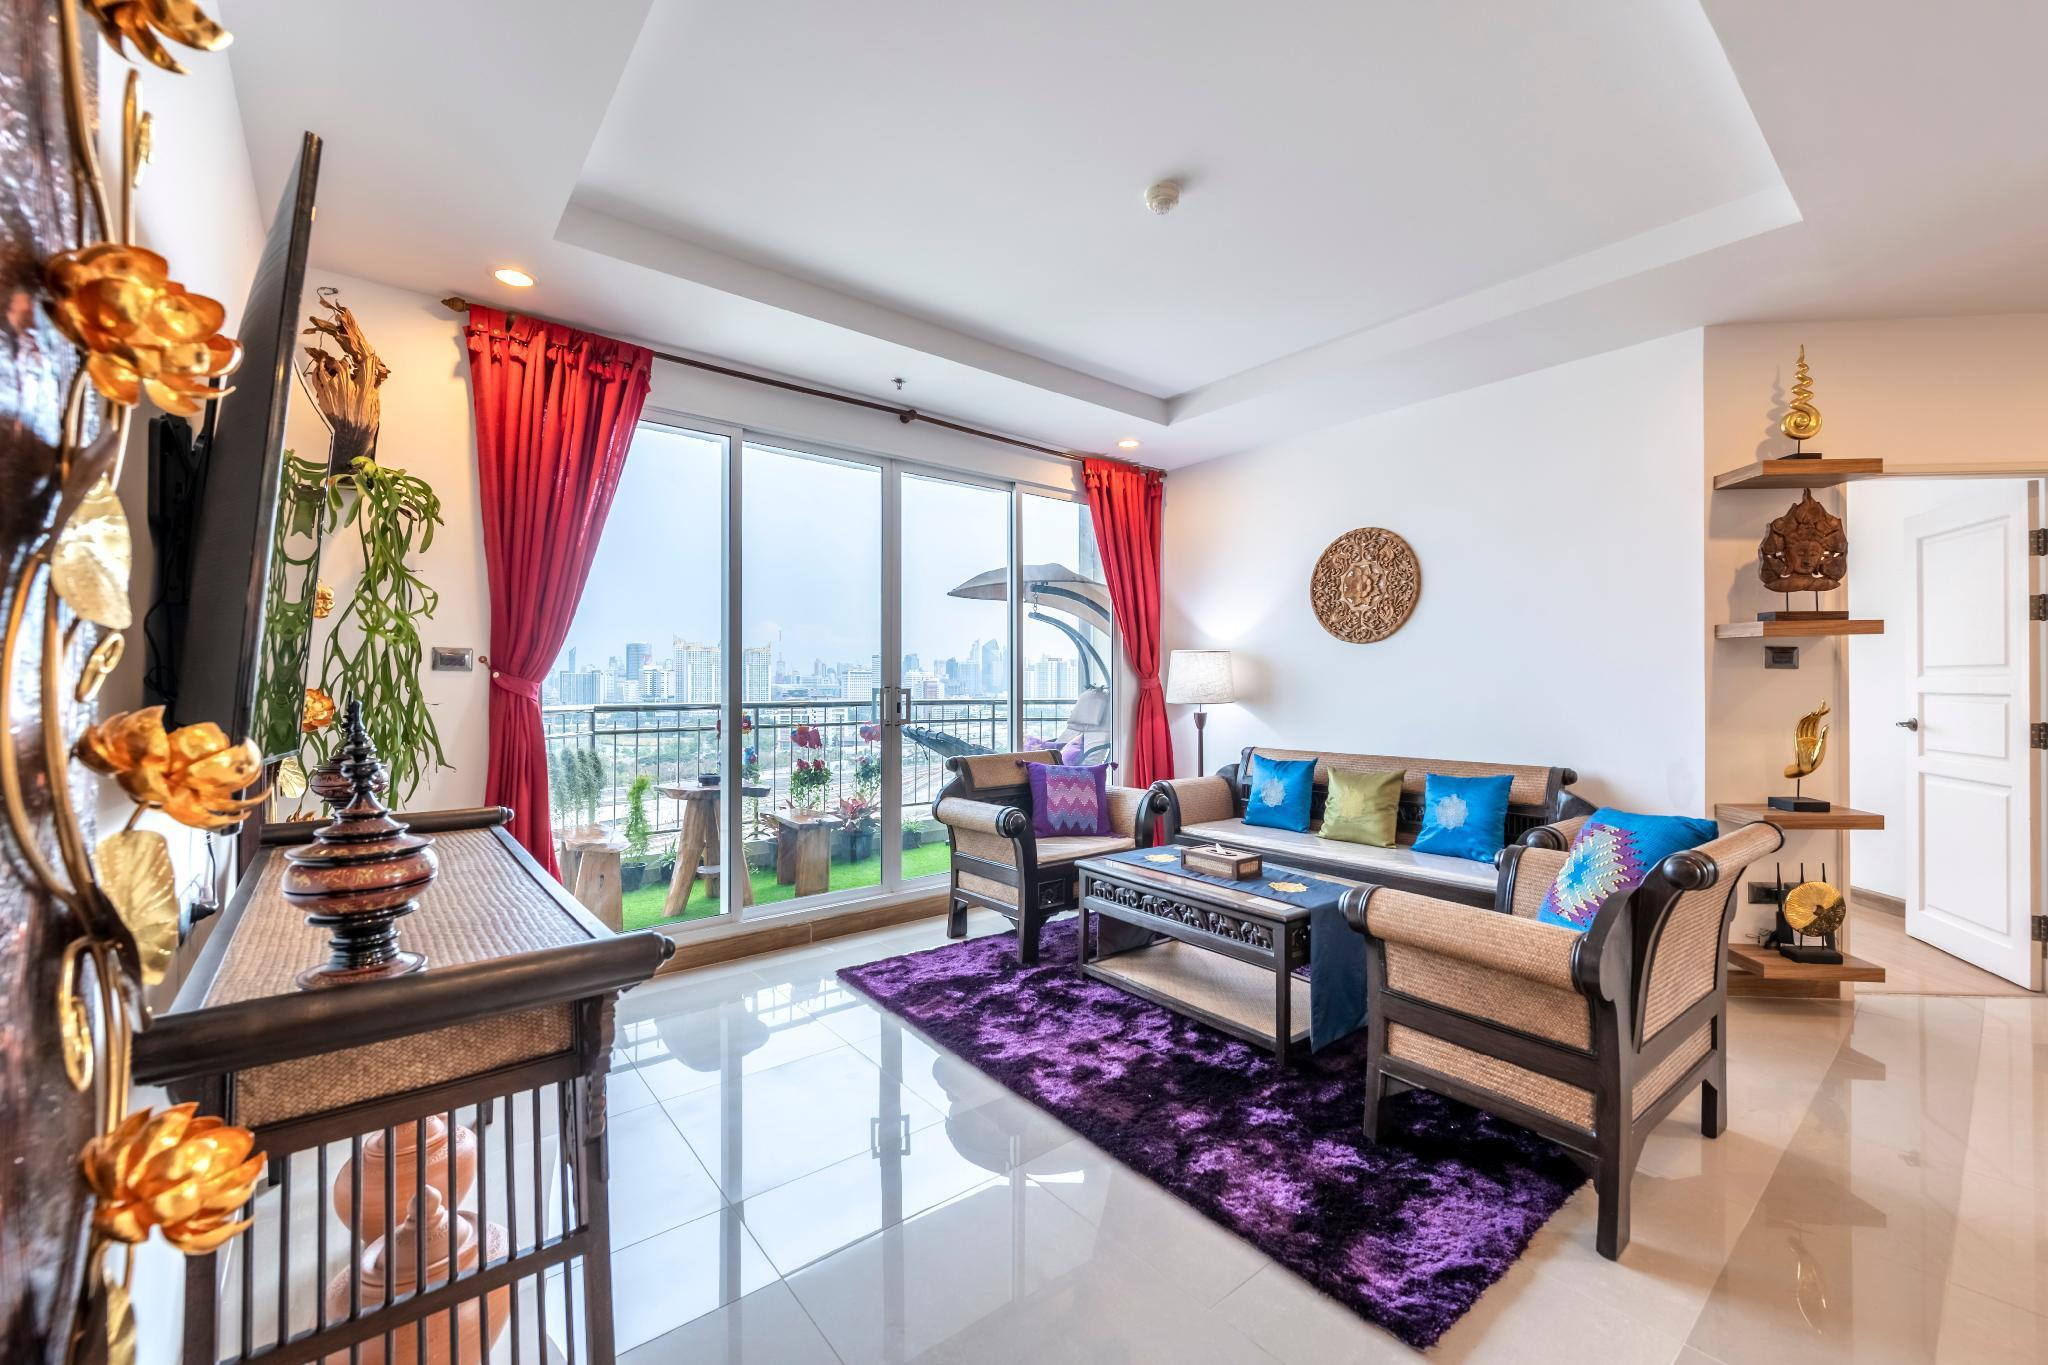 """YULI优丽""豪华公寓民宿 YULI Luxury Apartments อพาร์ตเมนต์ 3 ห้องนอน 3 ห้องน้ำส่วนตัว ขนาด 145 ตร.ม. – รัชดาภิเษก"